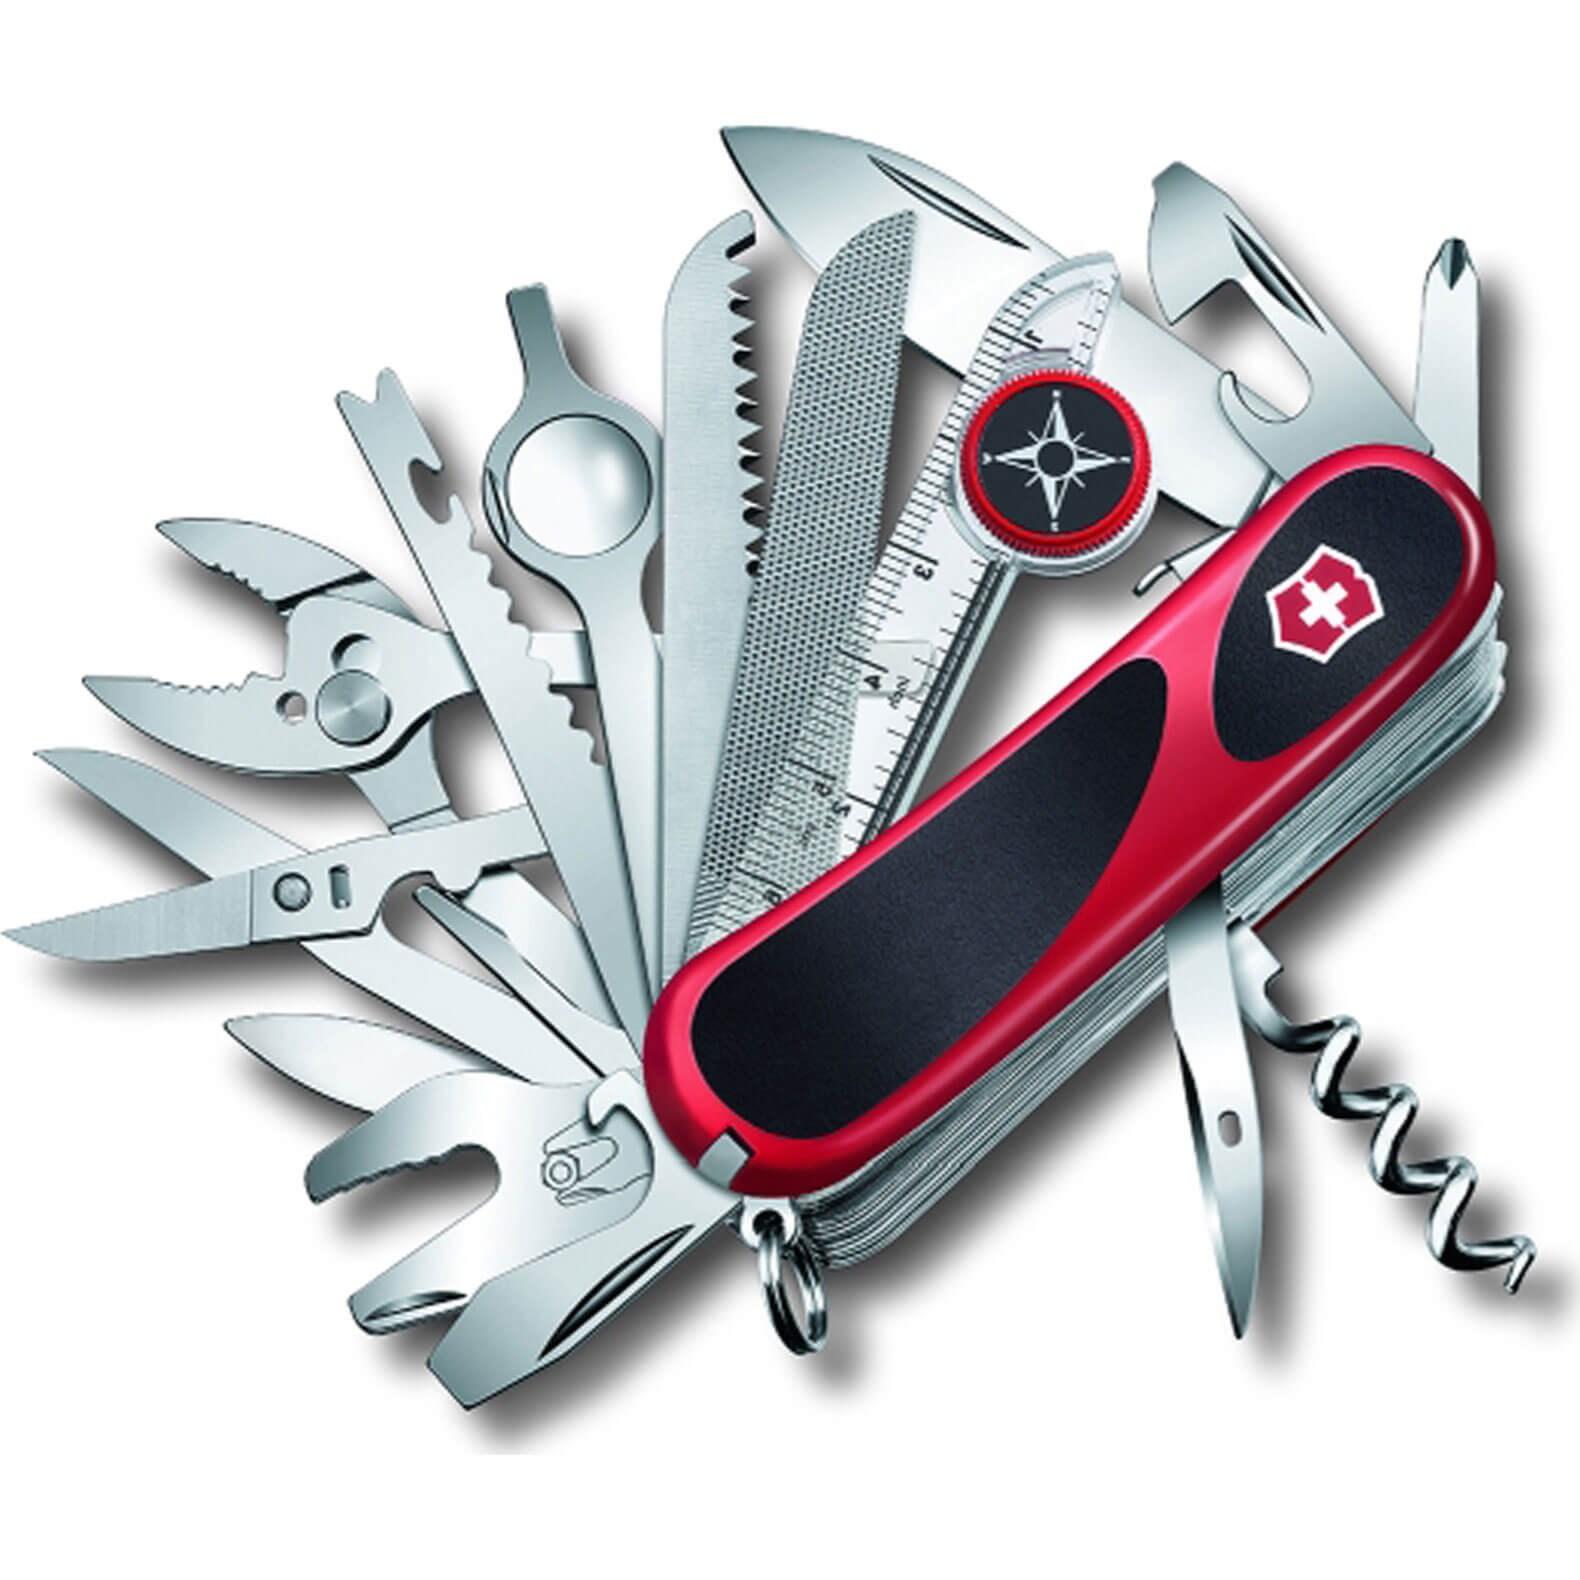 Victorinox Evolution S54 Swiss Army Knife